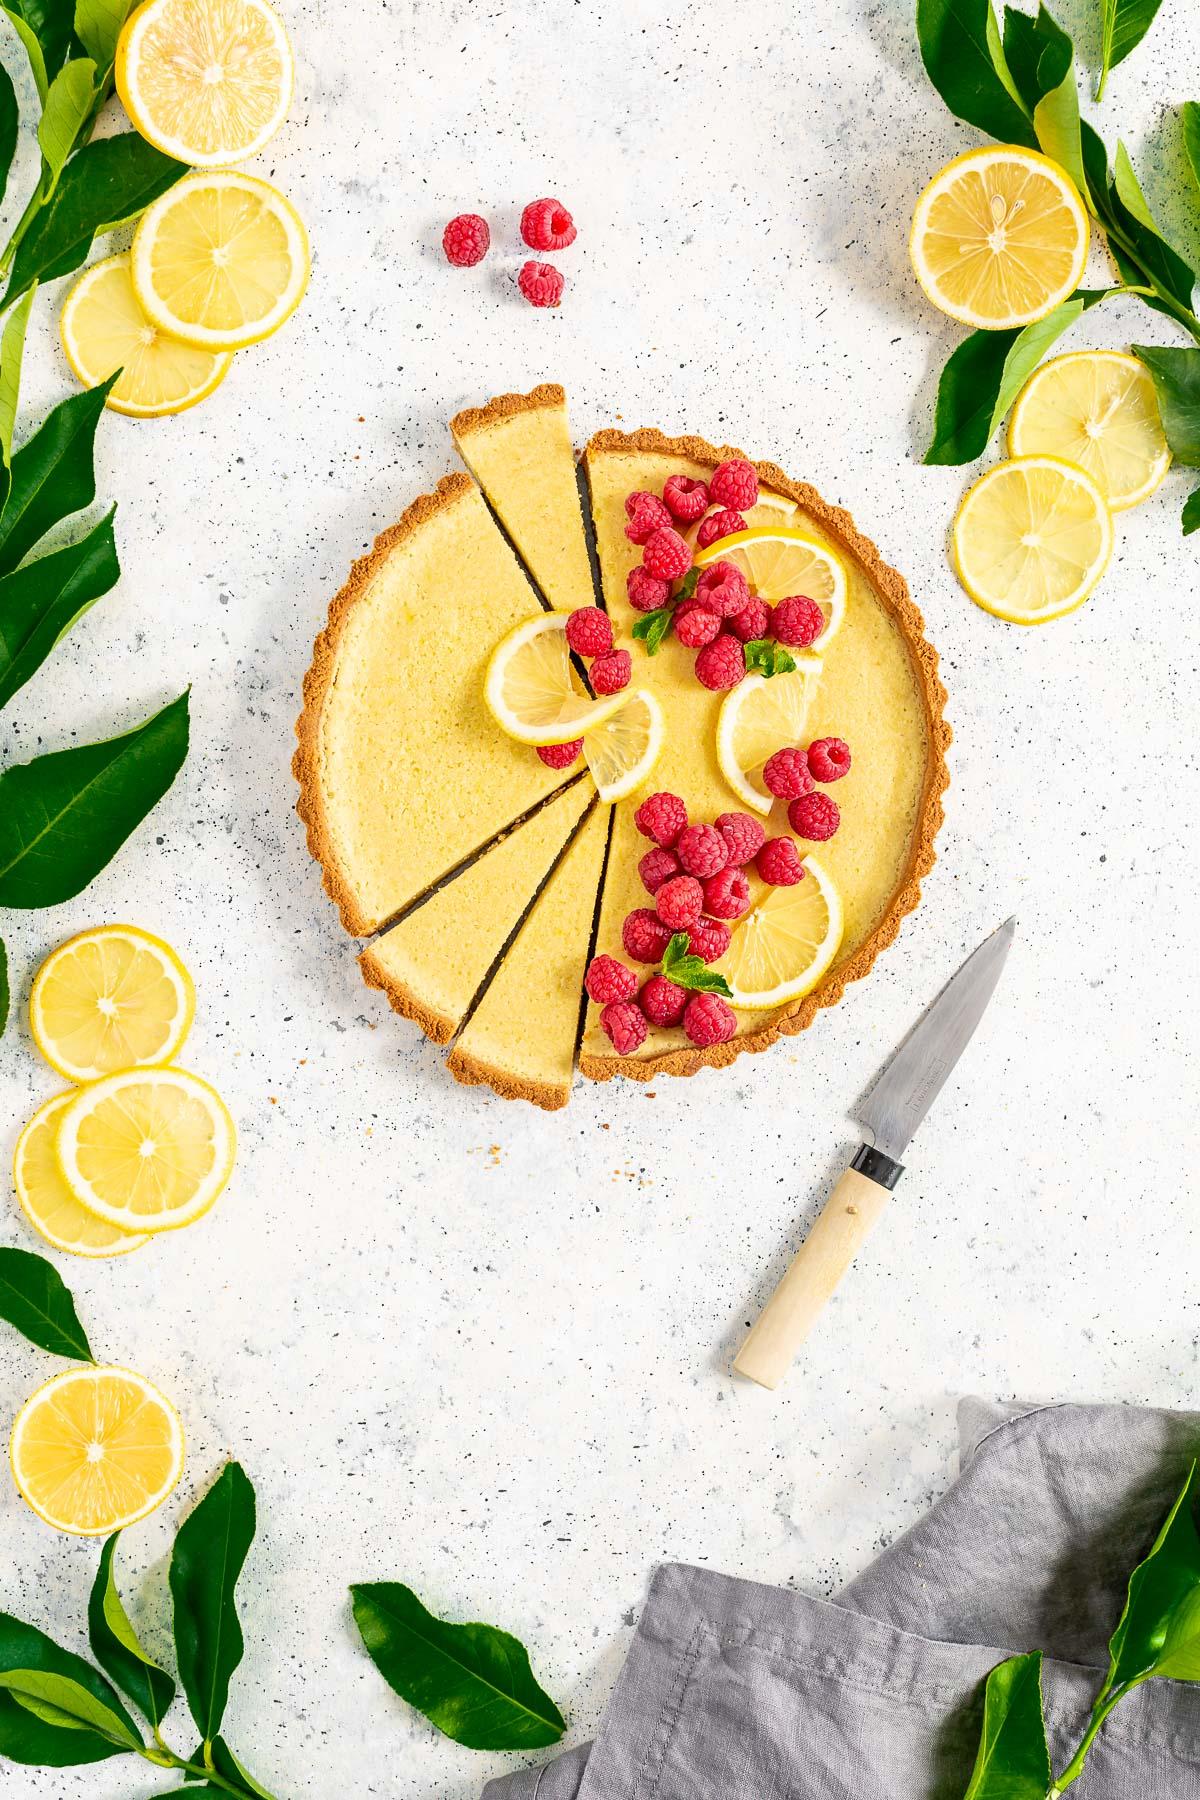 #CROSTATA al LIMONE VEGAN con pasta FROLLA ALLE MANDORLE senza glutine Gluten-Free Vegan Lemon Tart with Almond Crust Refined Sugar-Free